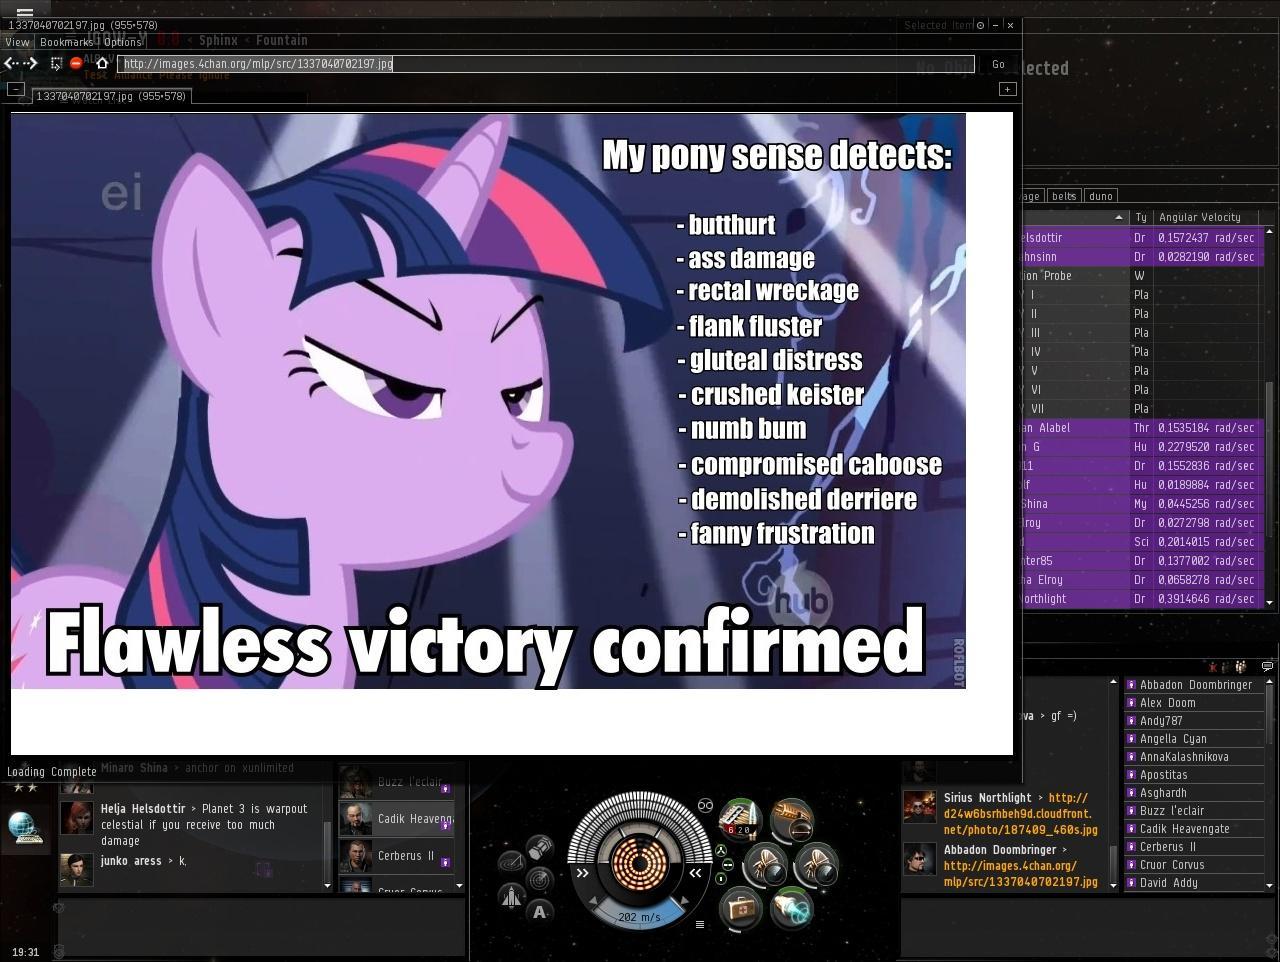 Eve online Memes